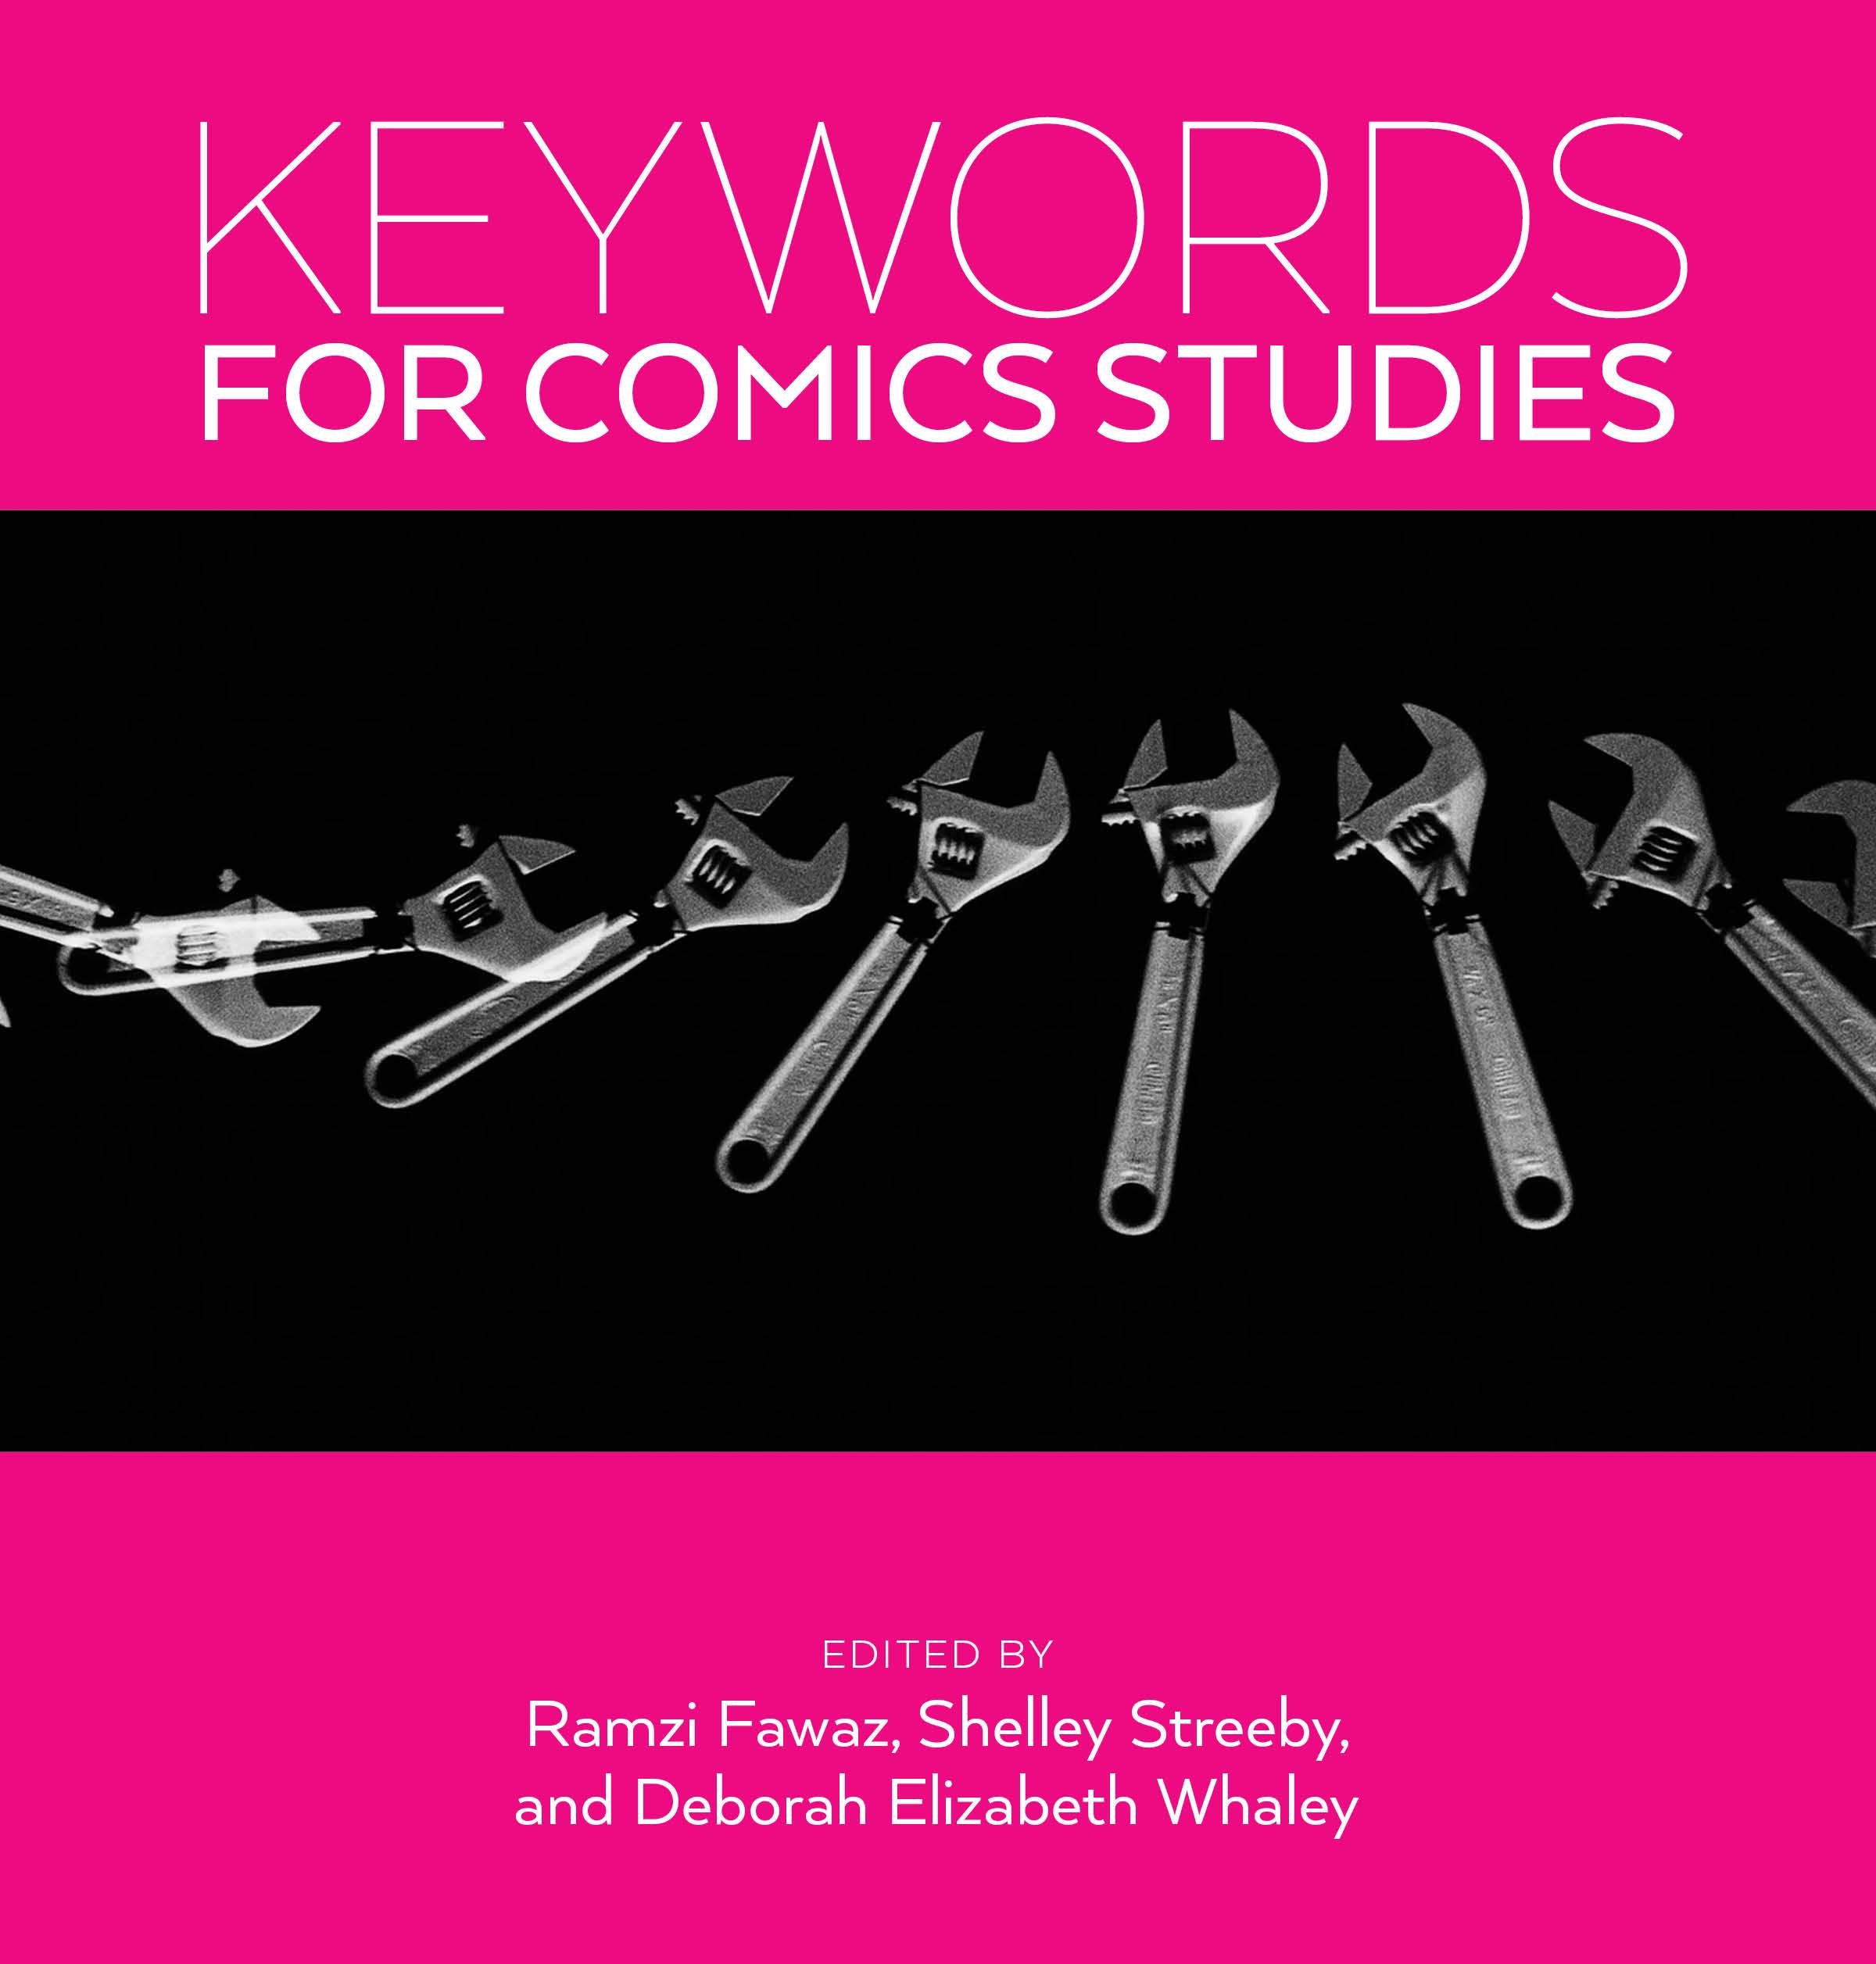 Keywords for Comics book title